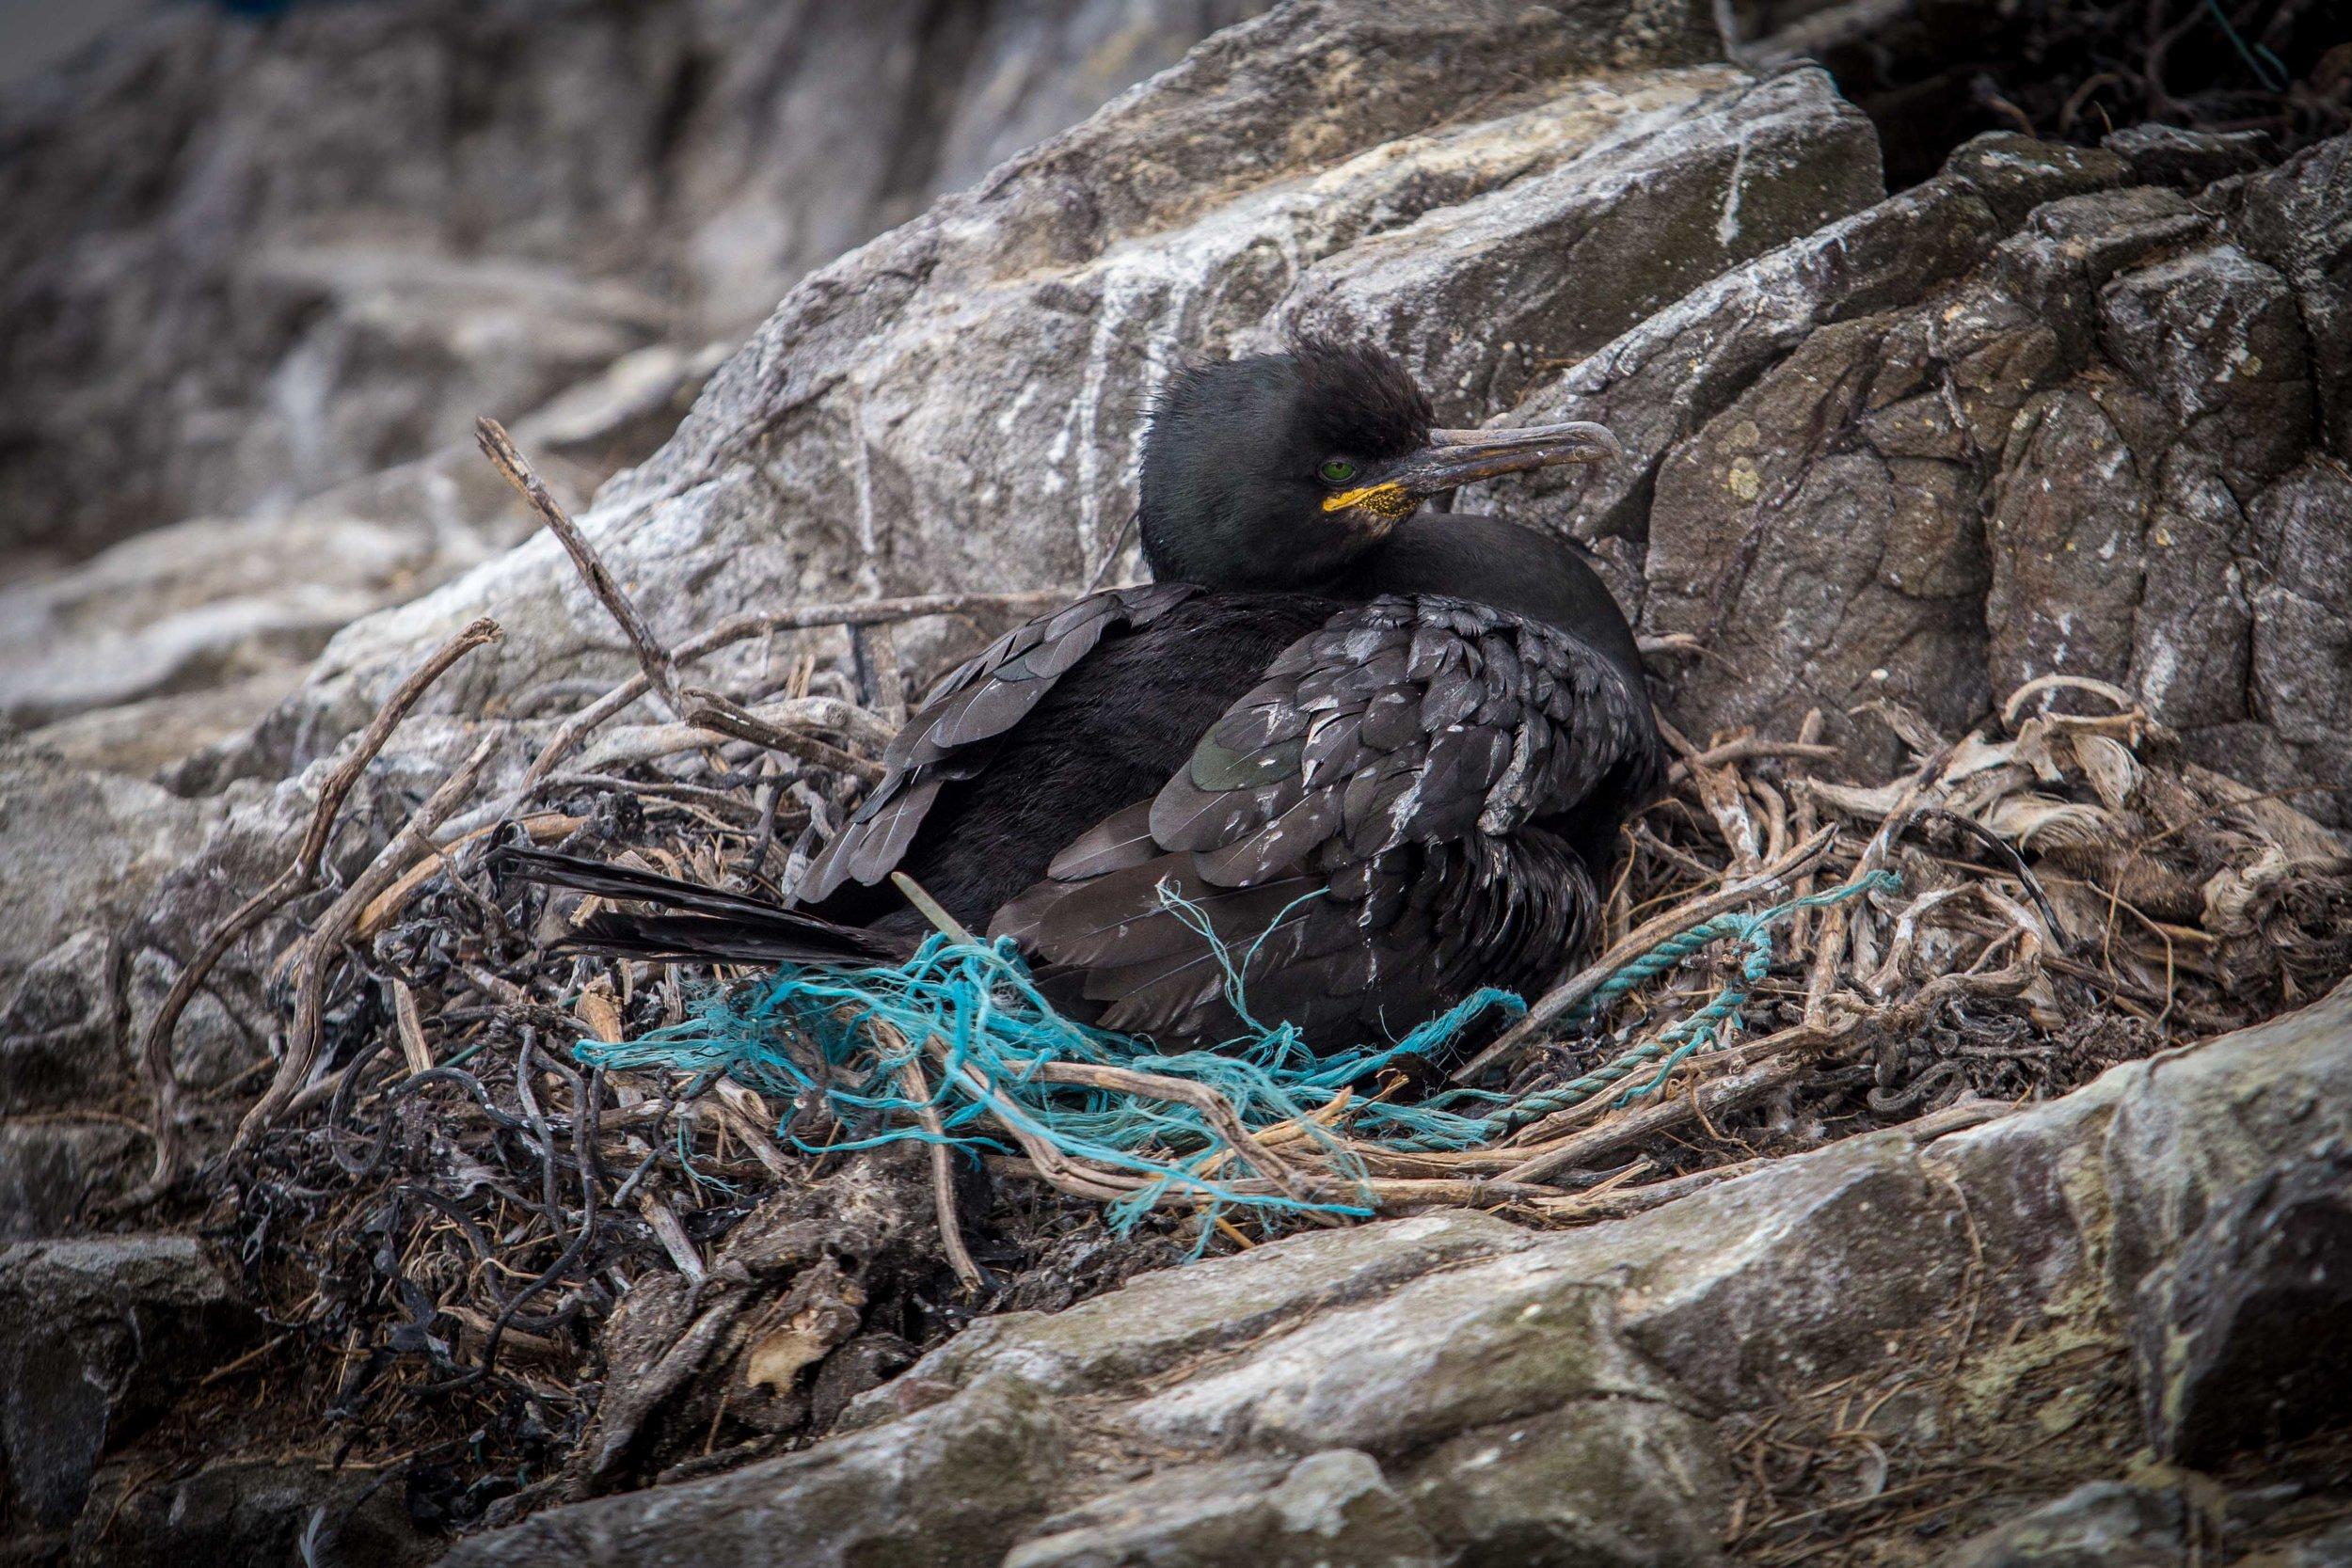 Bird in nest made of plastic